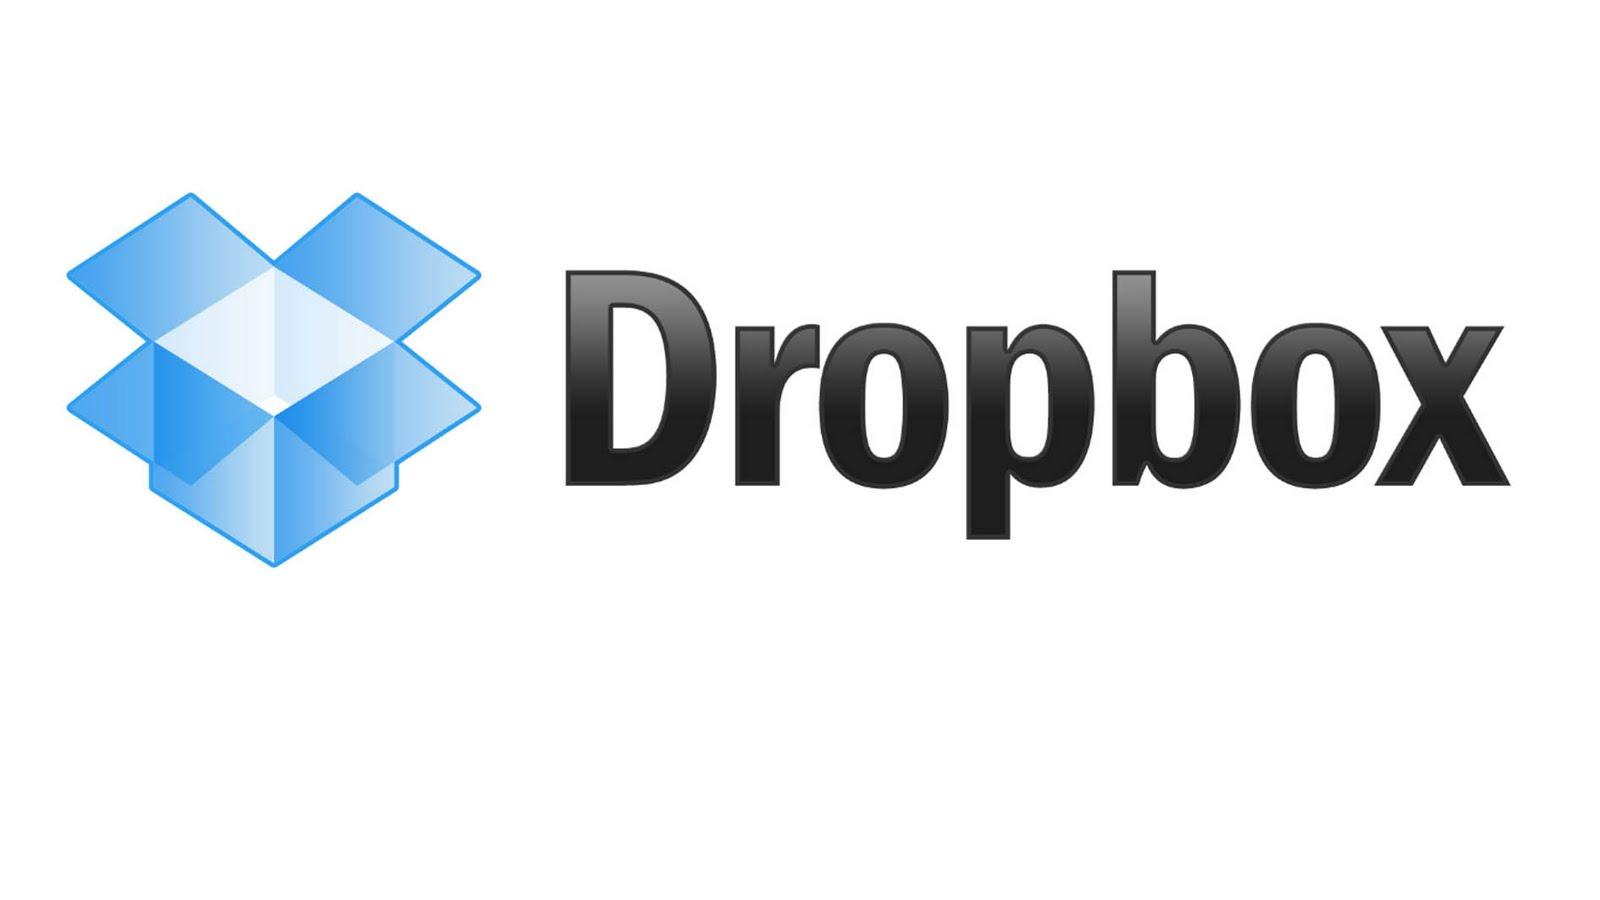 dropbox 2014 vk